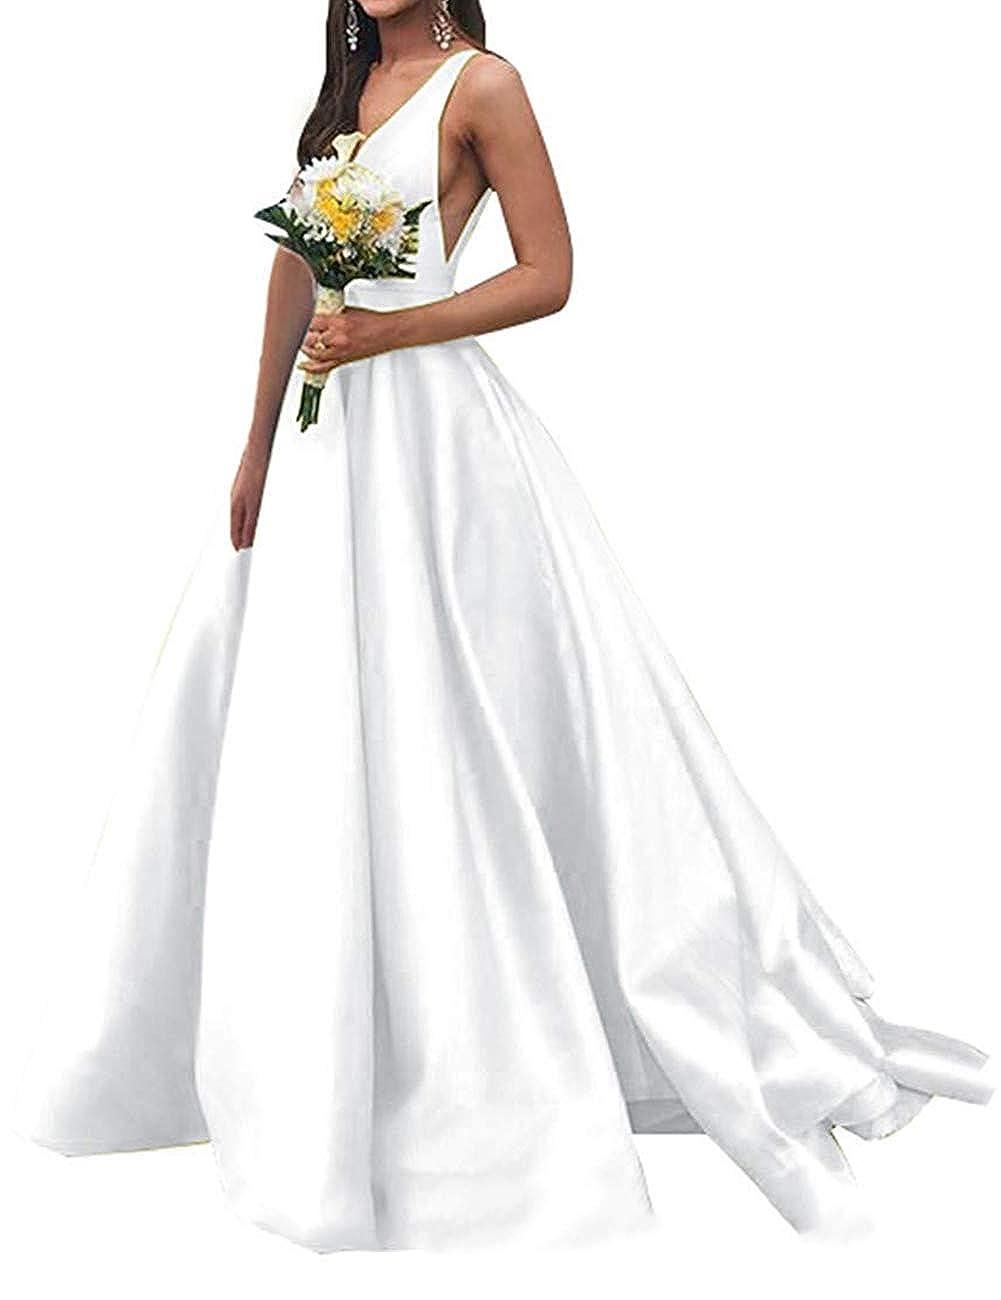 White JAEDEN Prom Dresses Formal Evening Gowns Long Evening Dresses V Neck Satin Prom Gowns Sleeveless